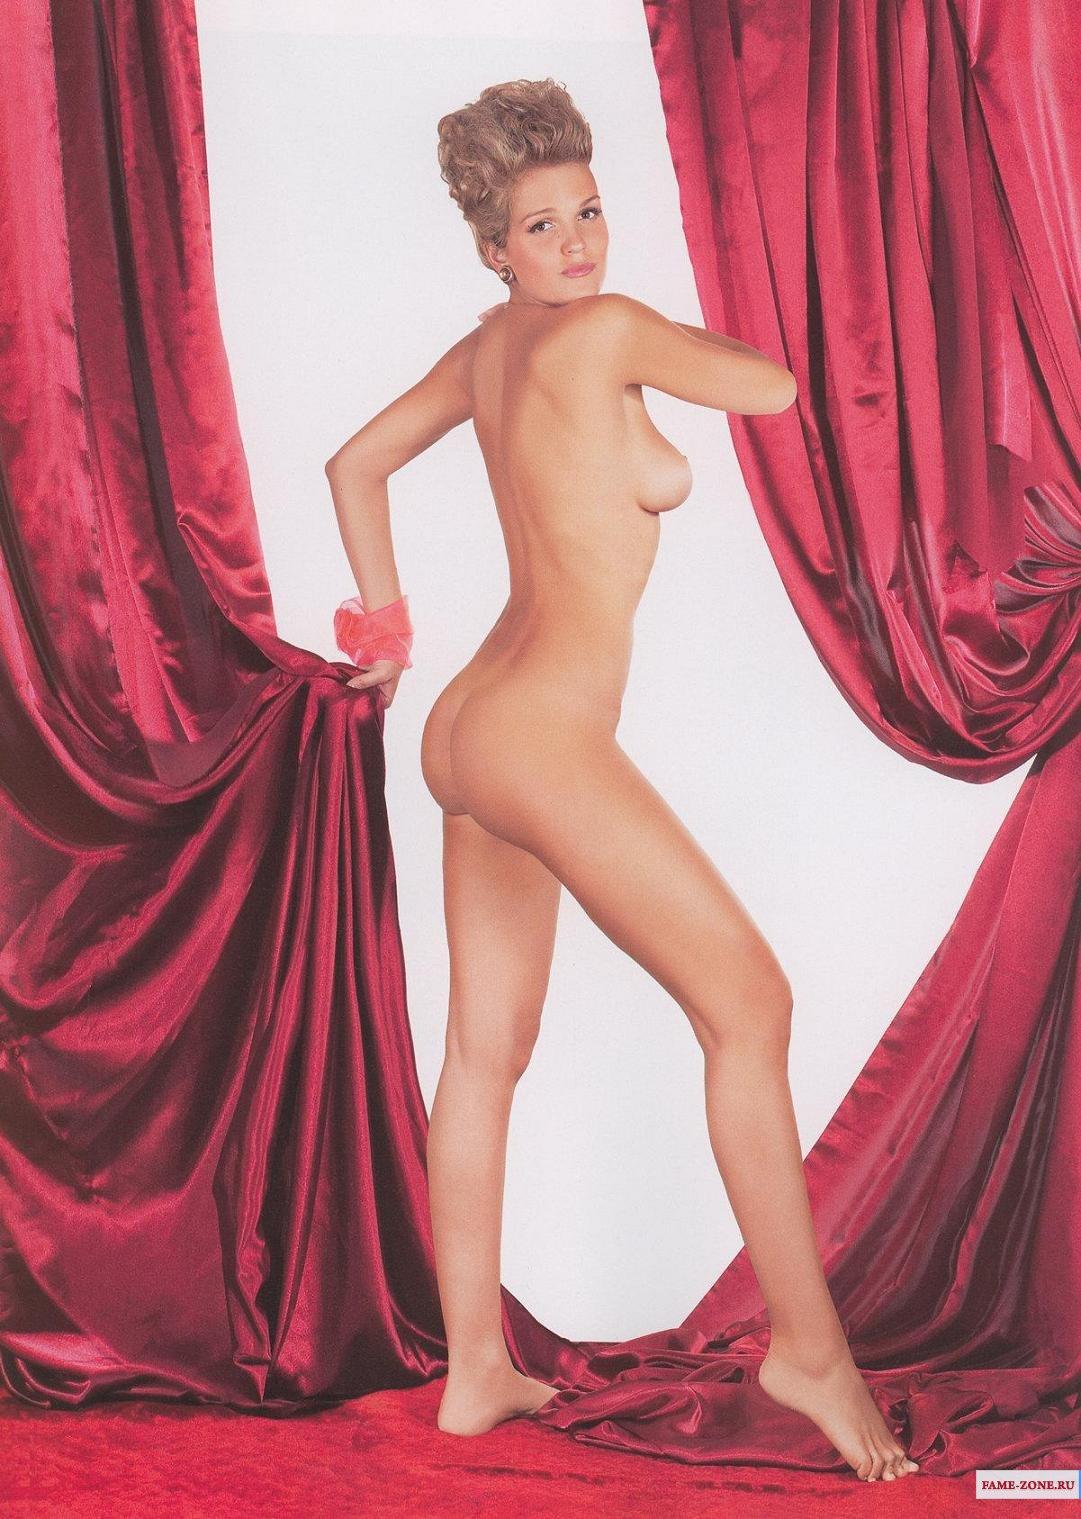 eroticheskie-fotografii-pevitsi-anastacia